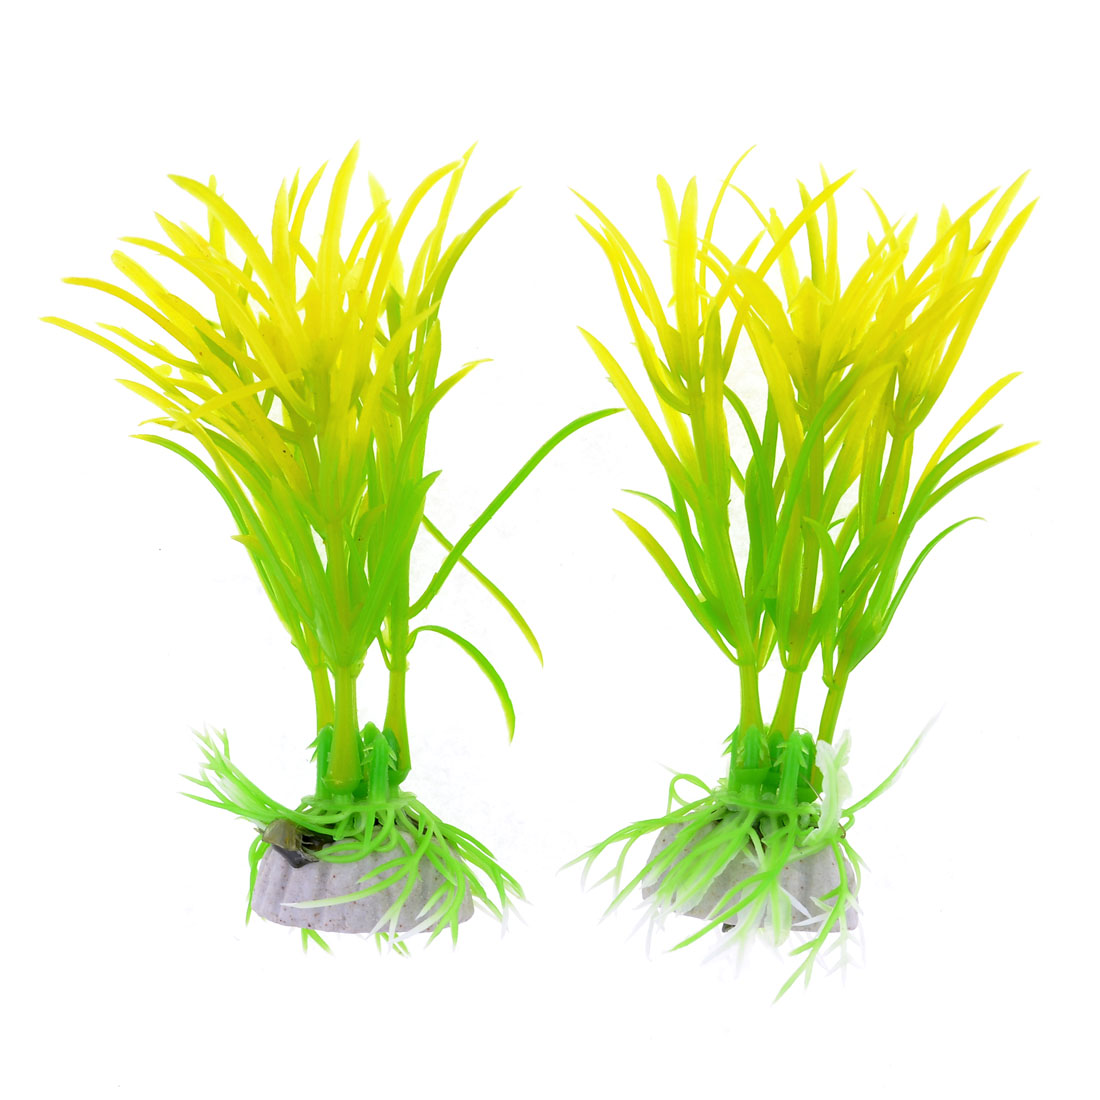 2 Pcs Yellowgreen Plastic Aquascaping Plant Grass for Fish Tank Aquarium